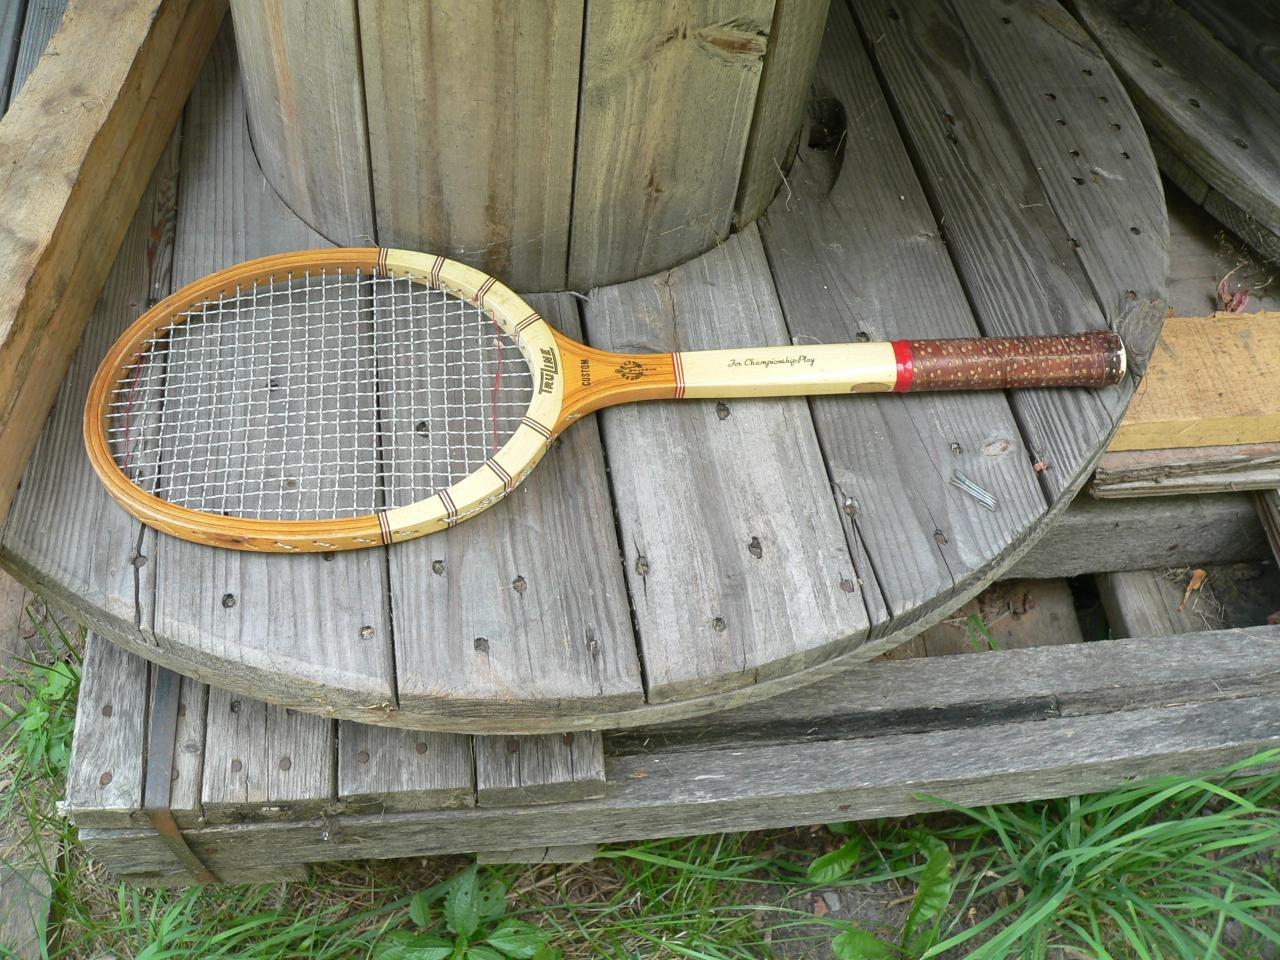 Raquette de tennis # 3204.1